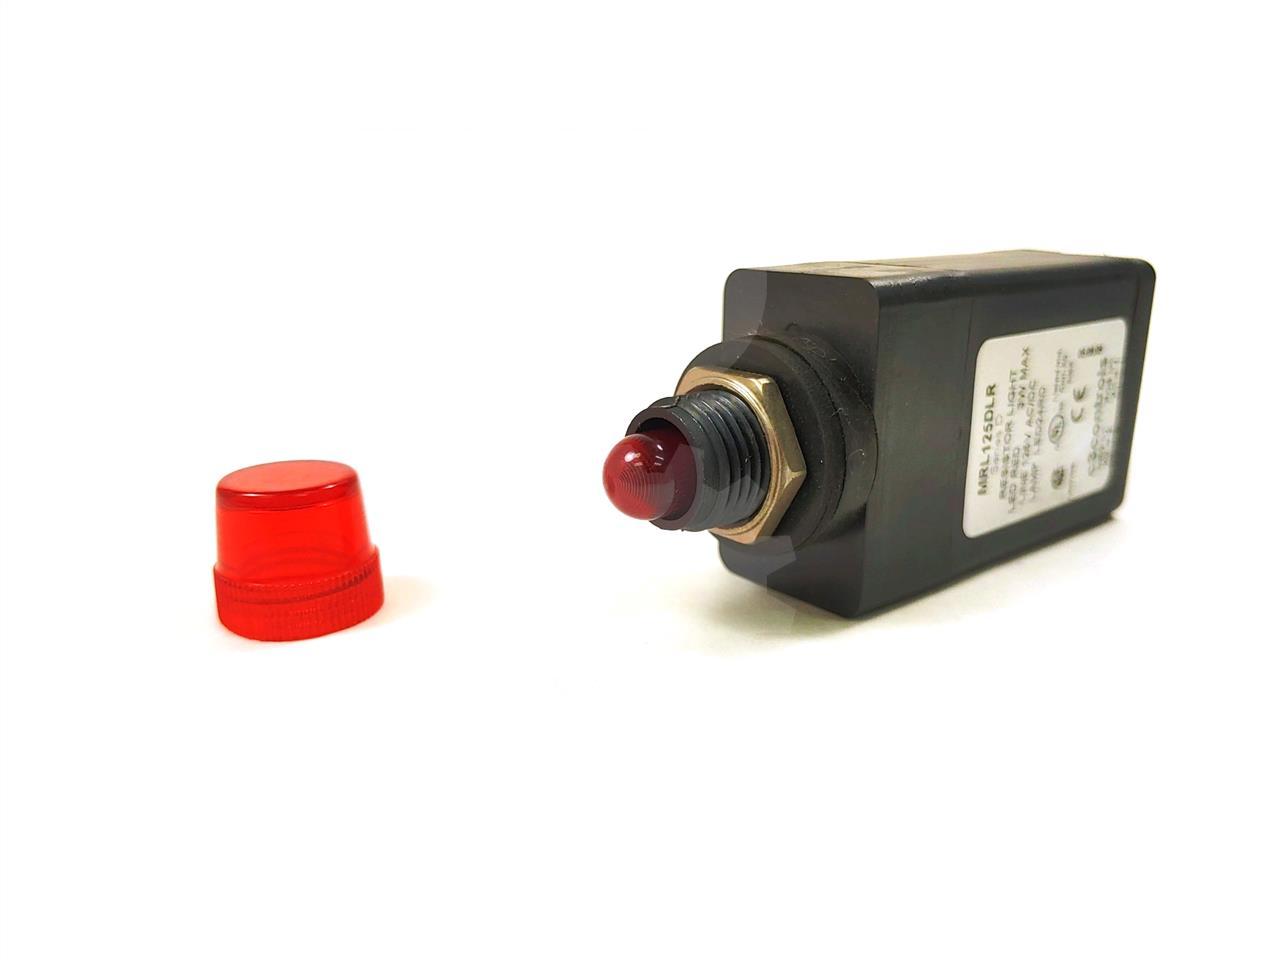 C3 Controls C3 CONTROLS 16MM RESISTOR TYPE LED INDICATING LIGHT ASSEMBLY UNUSED SURPLUS